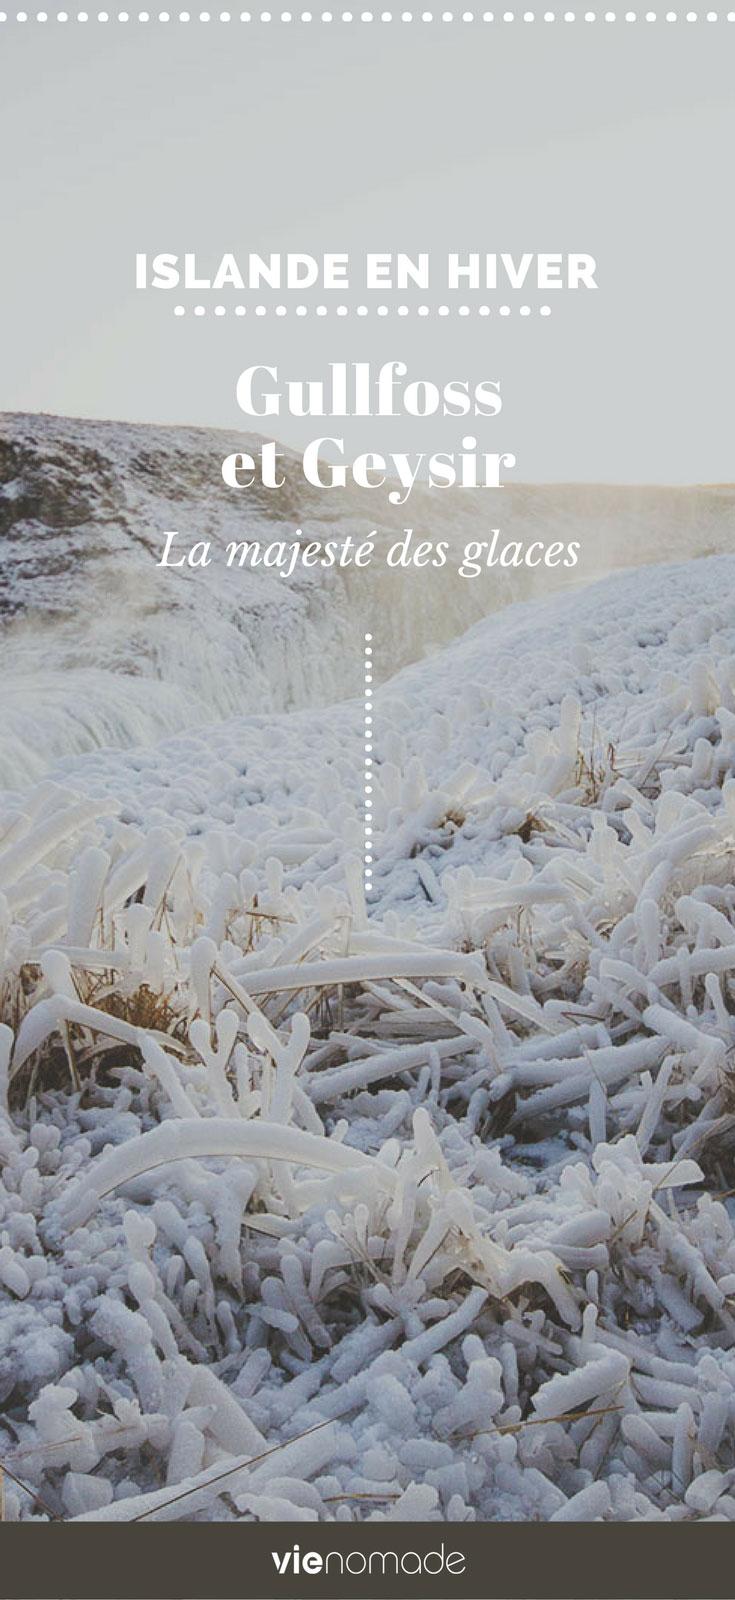 Islande: Visiter Gullfoss et Geysir en hiver